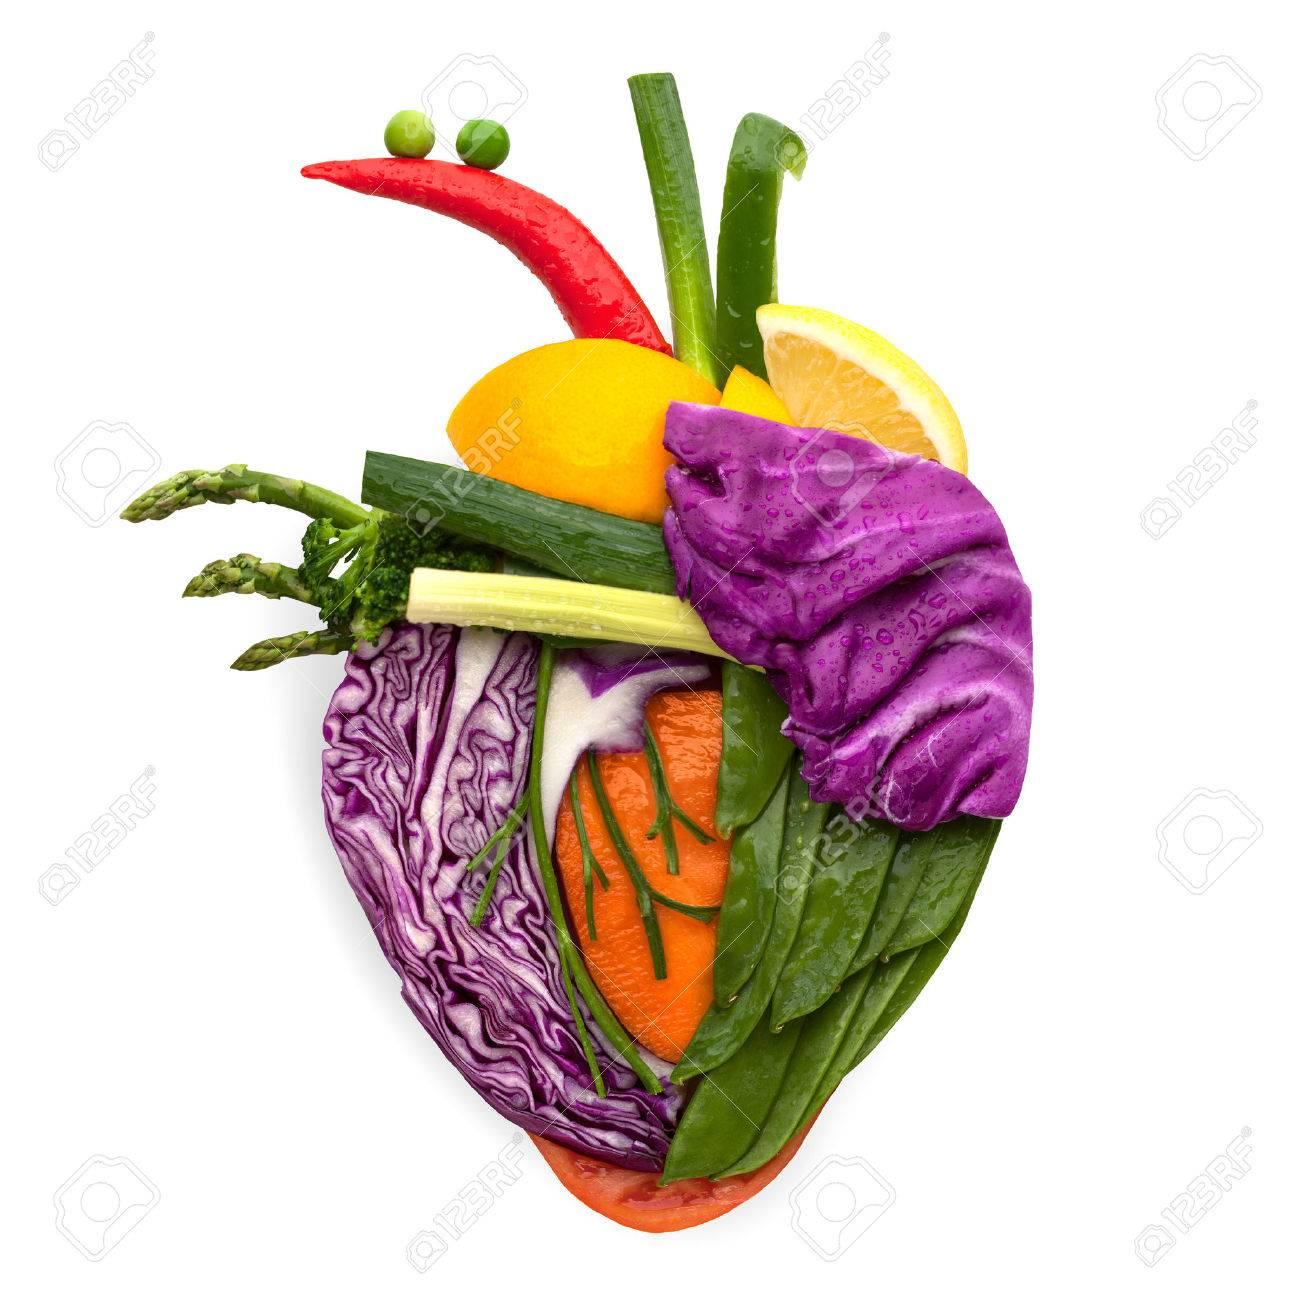 fruit vegetable dish stock photos royalty free fruit vegetable